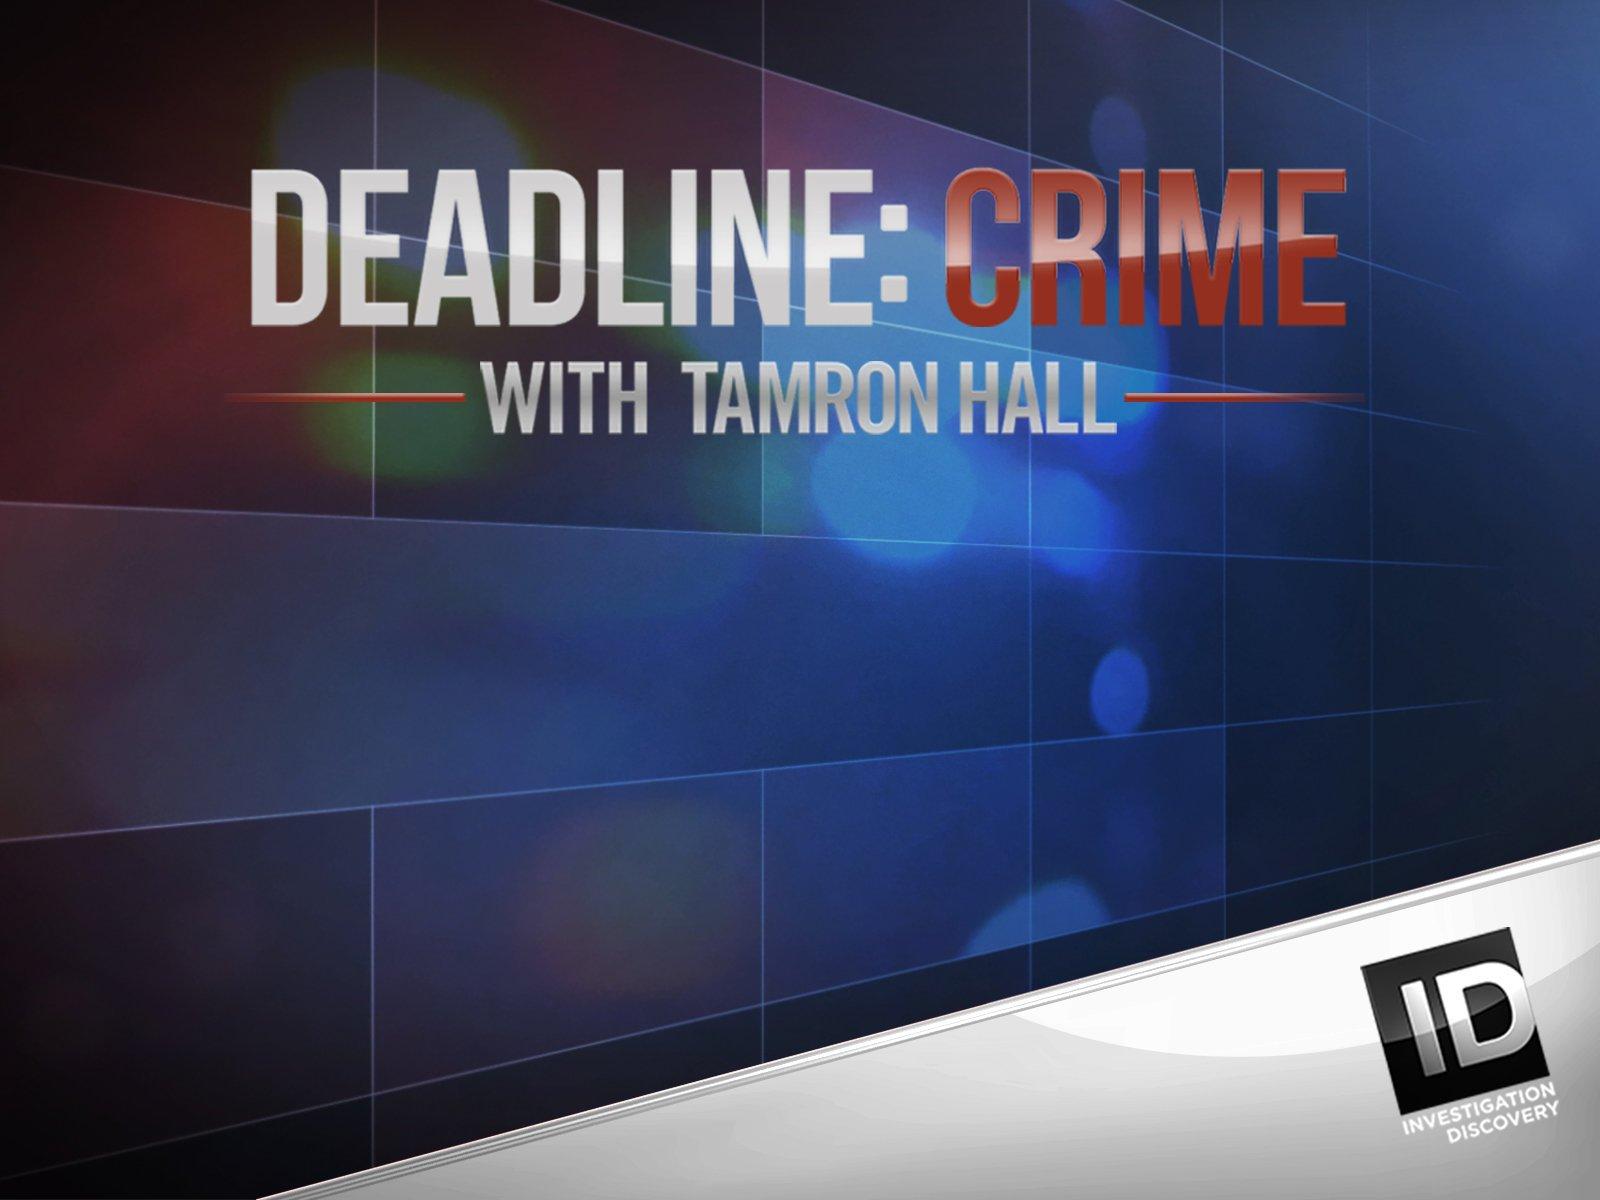 Amazon com: Watch Deadline Crime with Tamron Hall Season 1 | Prime Video